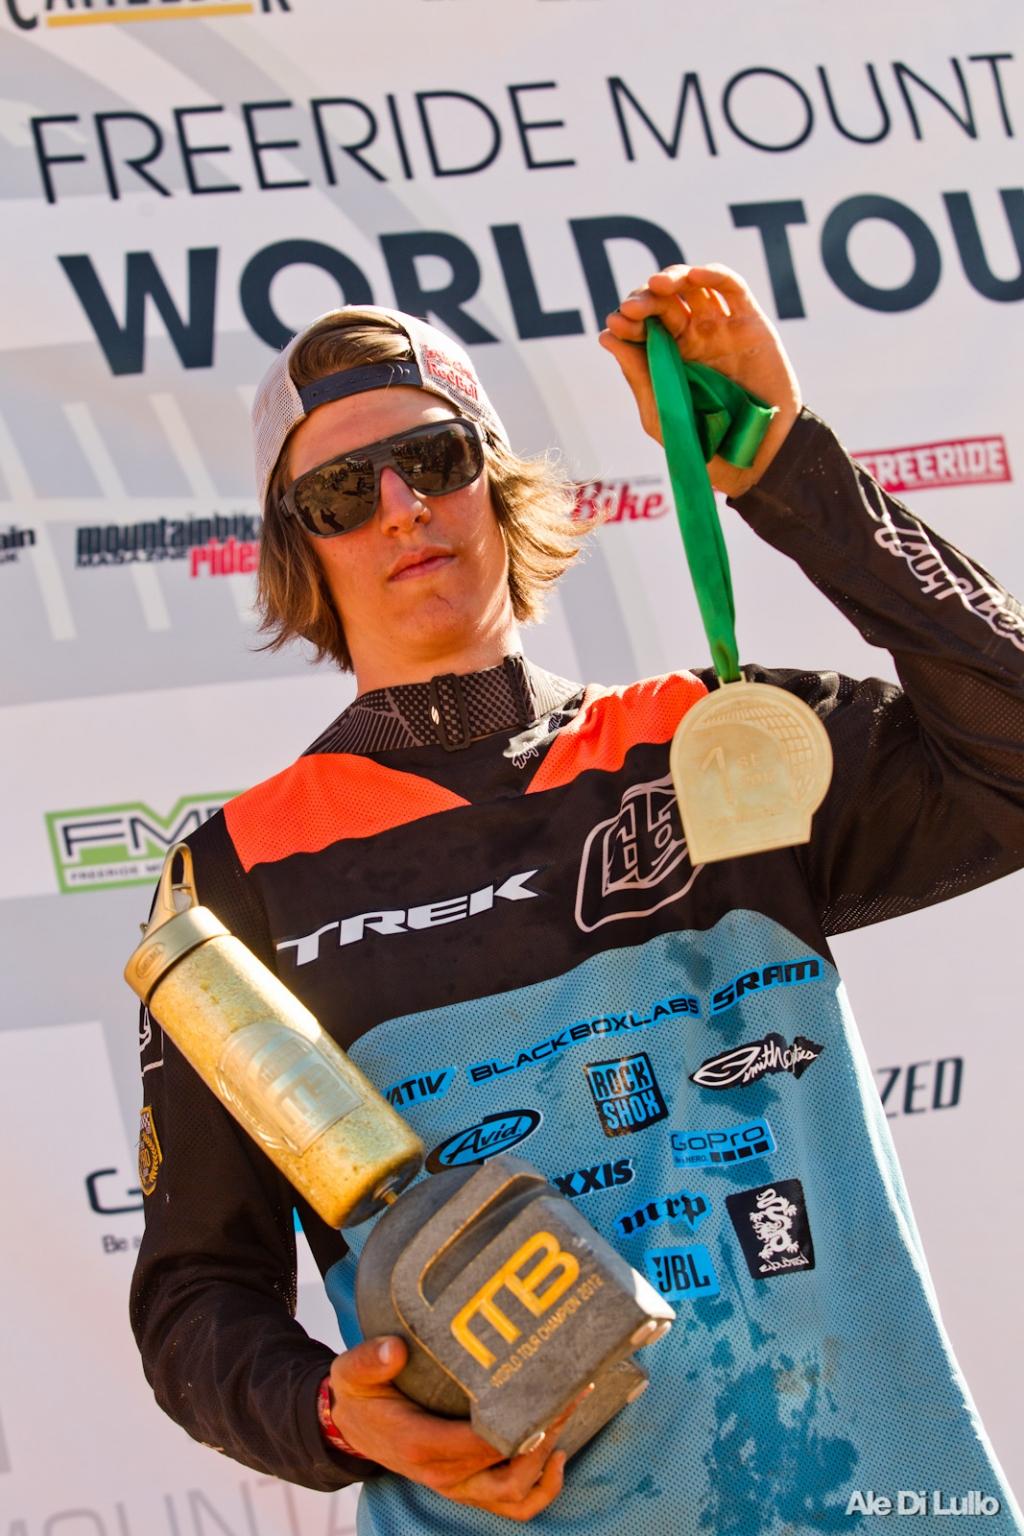 RB_RAMPAGE_FMBA Overall Winner_Utah 2012_by AleDiLullo-6243